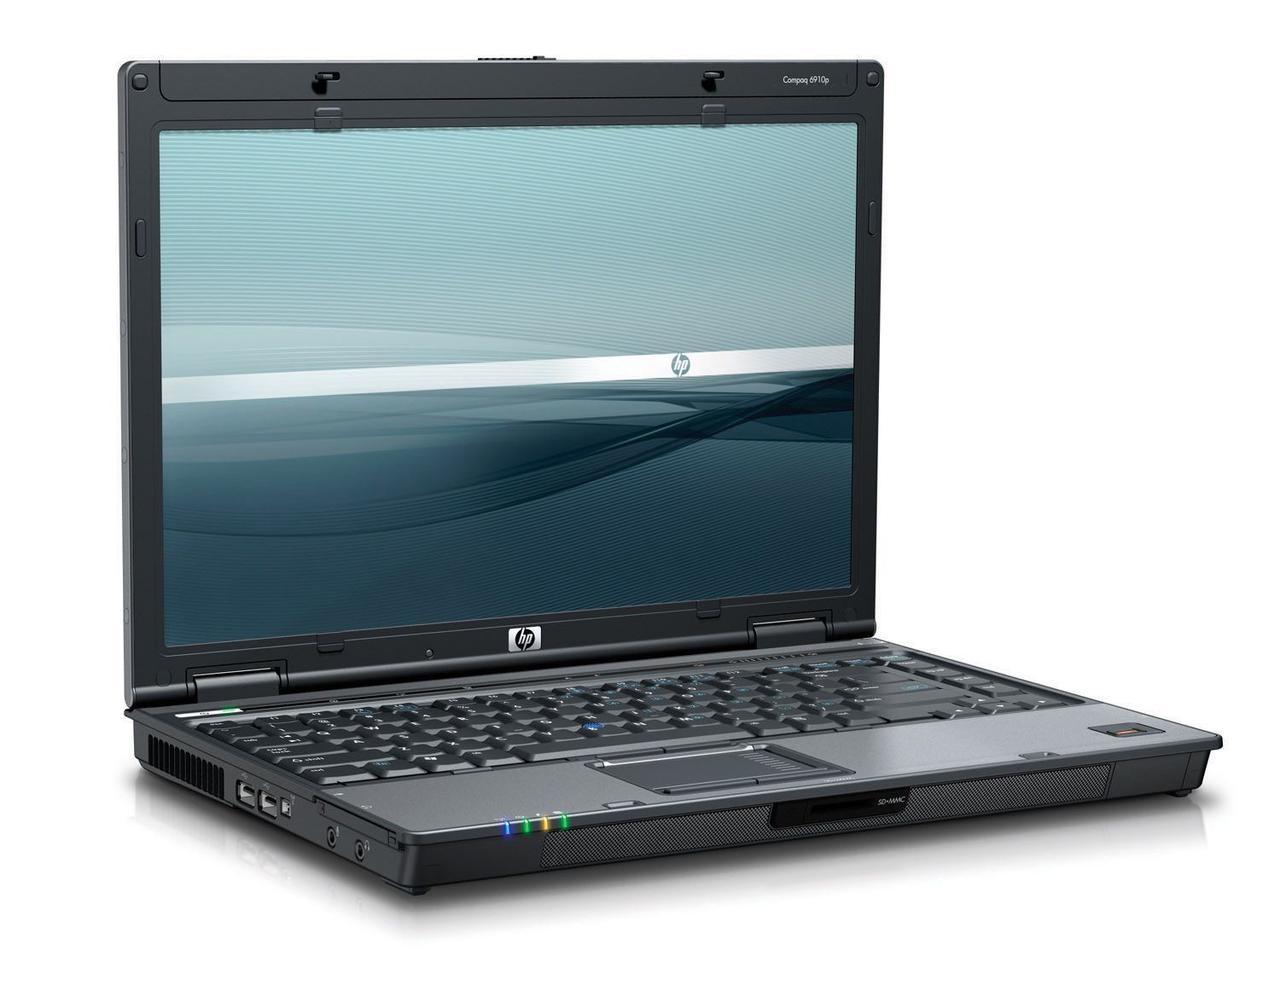 Ноутбук HP Compag 6910p-Intel-Core 2 Duo-T7500-2.2GHz-1Gb-DDR2-320Gb-DVD-R-W14-(B)- Б/У